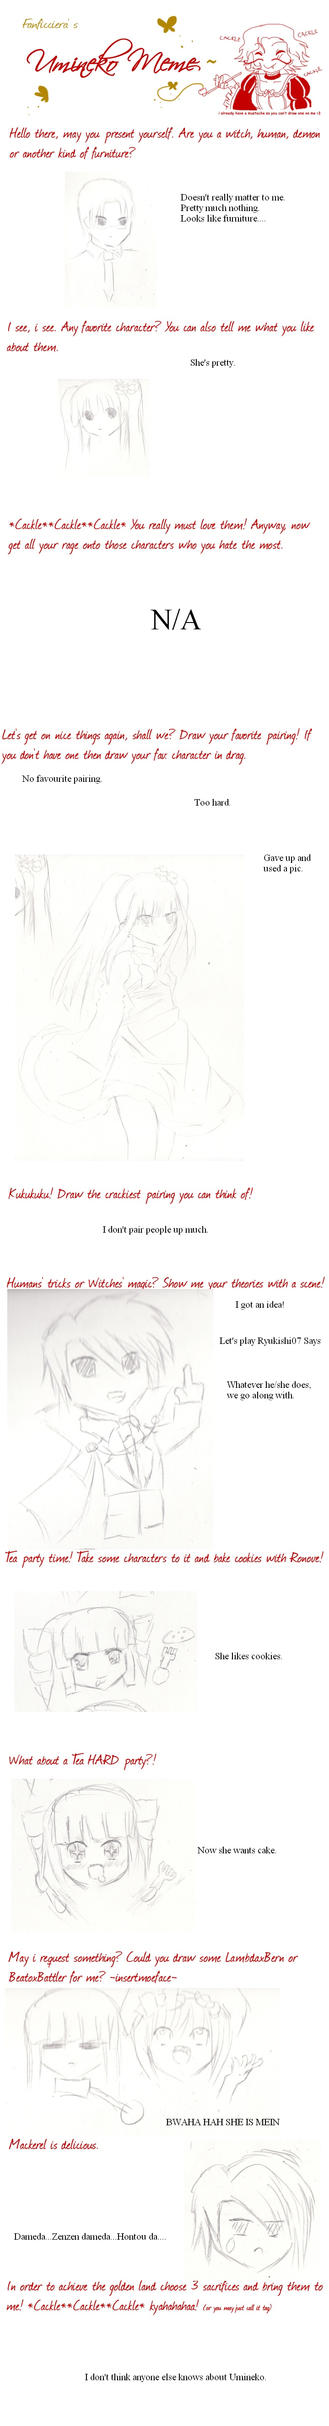 Umineko Meme by raikeisho